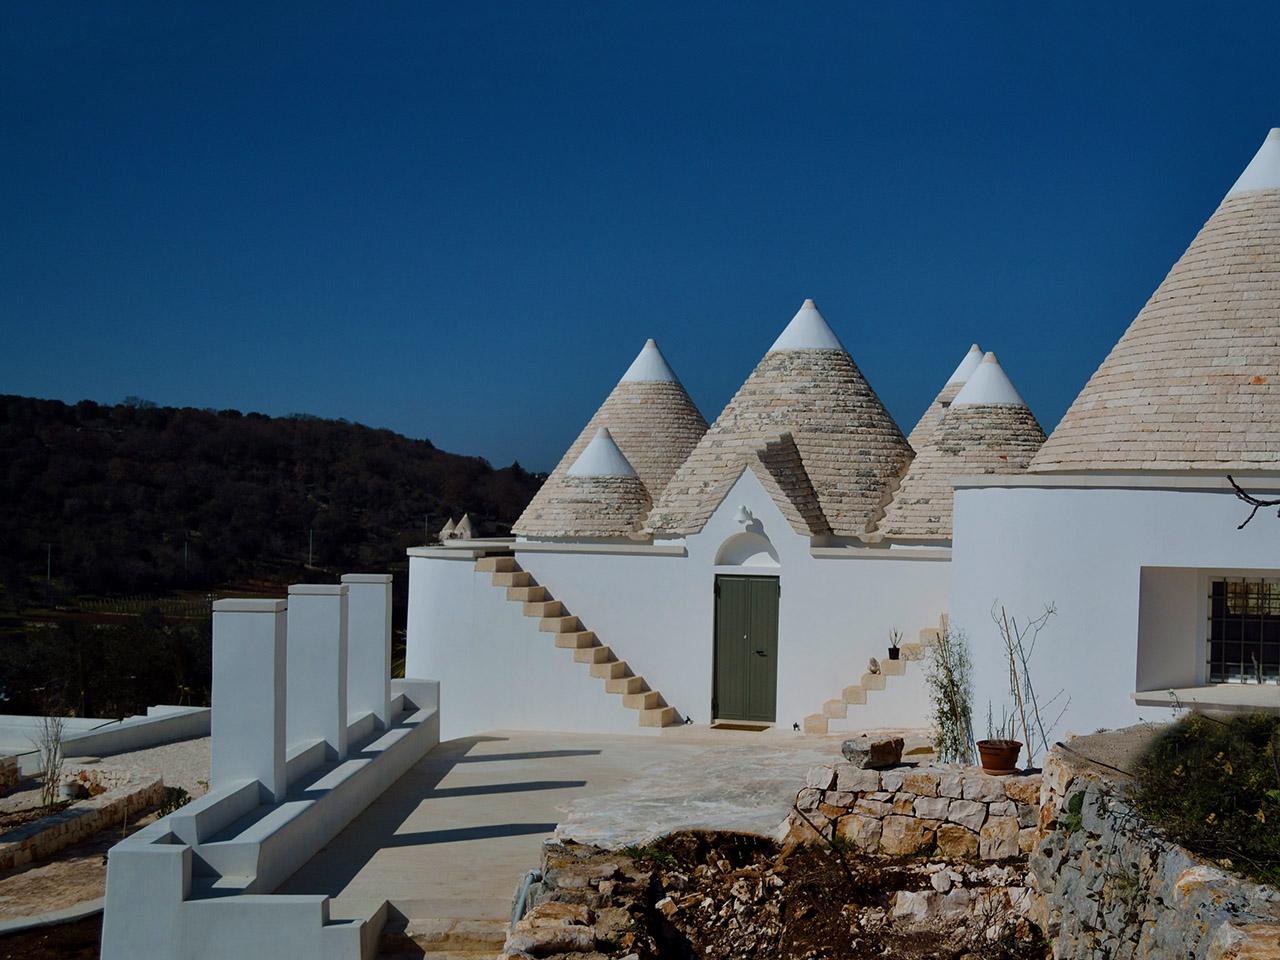 costruzioni restauri sirio ostuni residenza privata montesasso ostuni dsc 0094 2